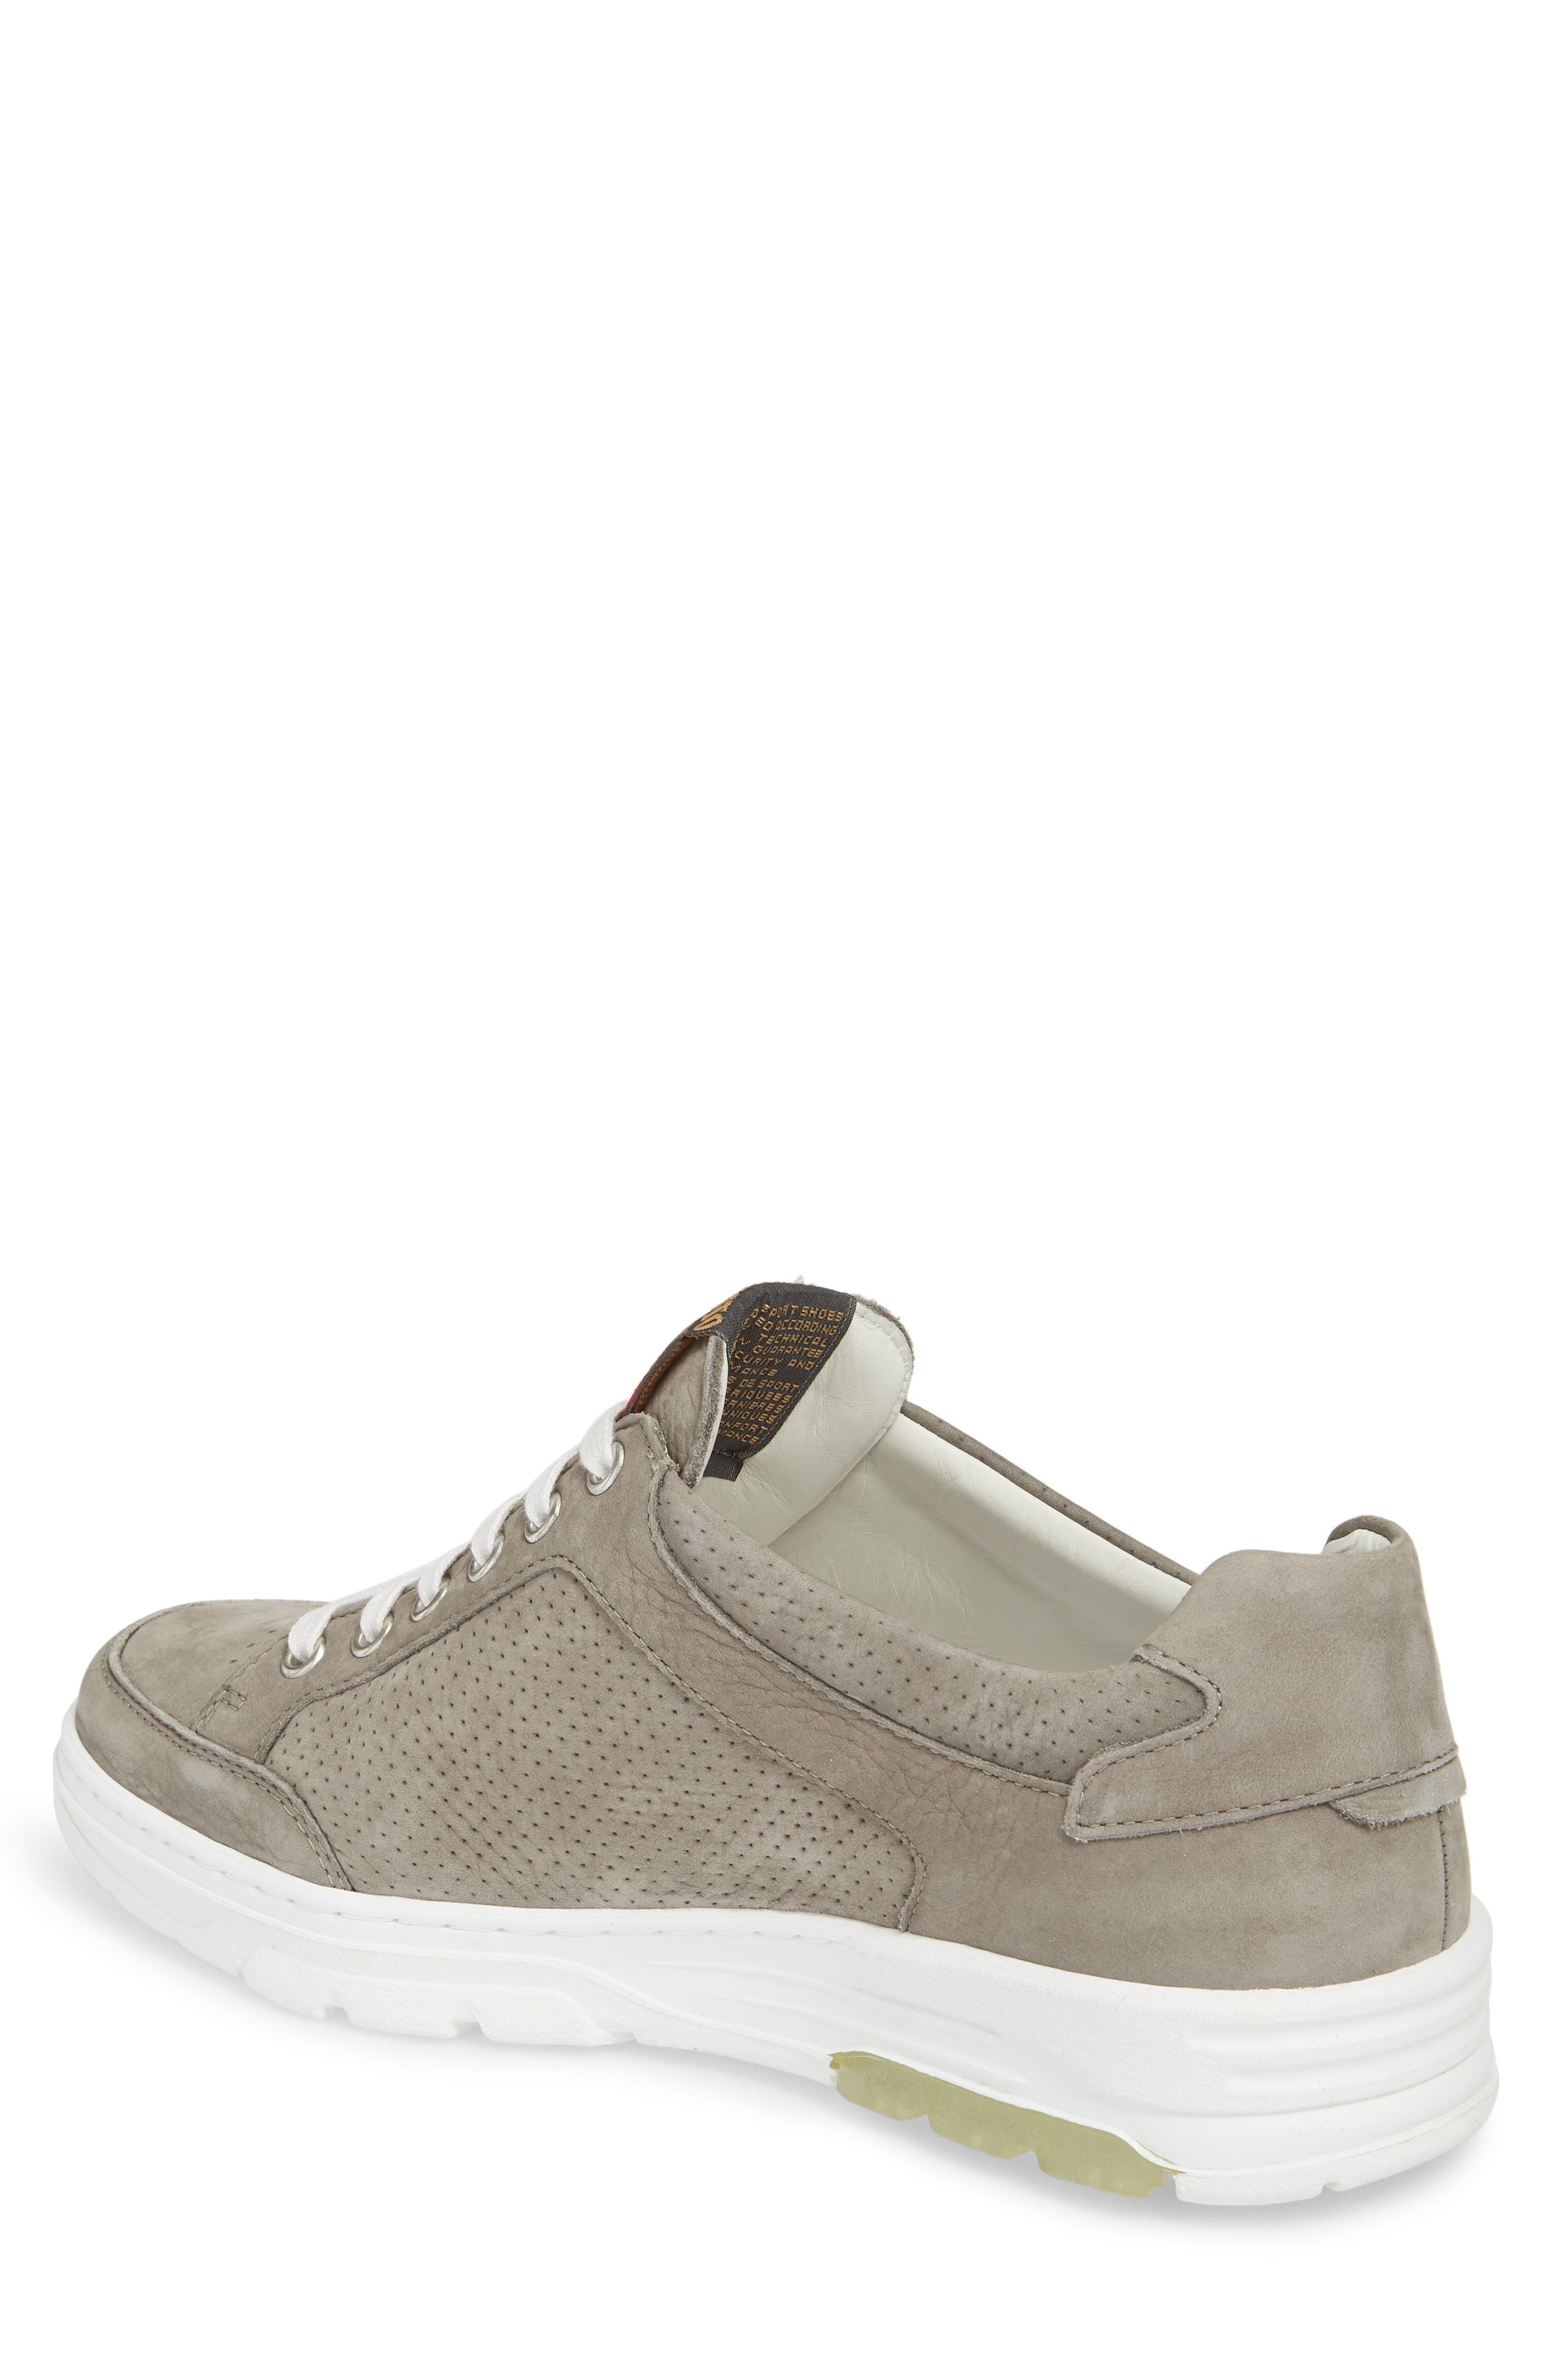 Mathias Perforated Sneaker,                             Alternate thumbnail 2, color,                             Light Grey